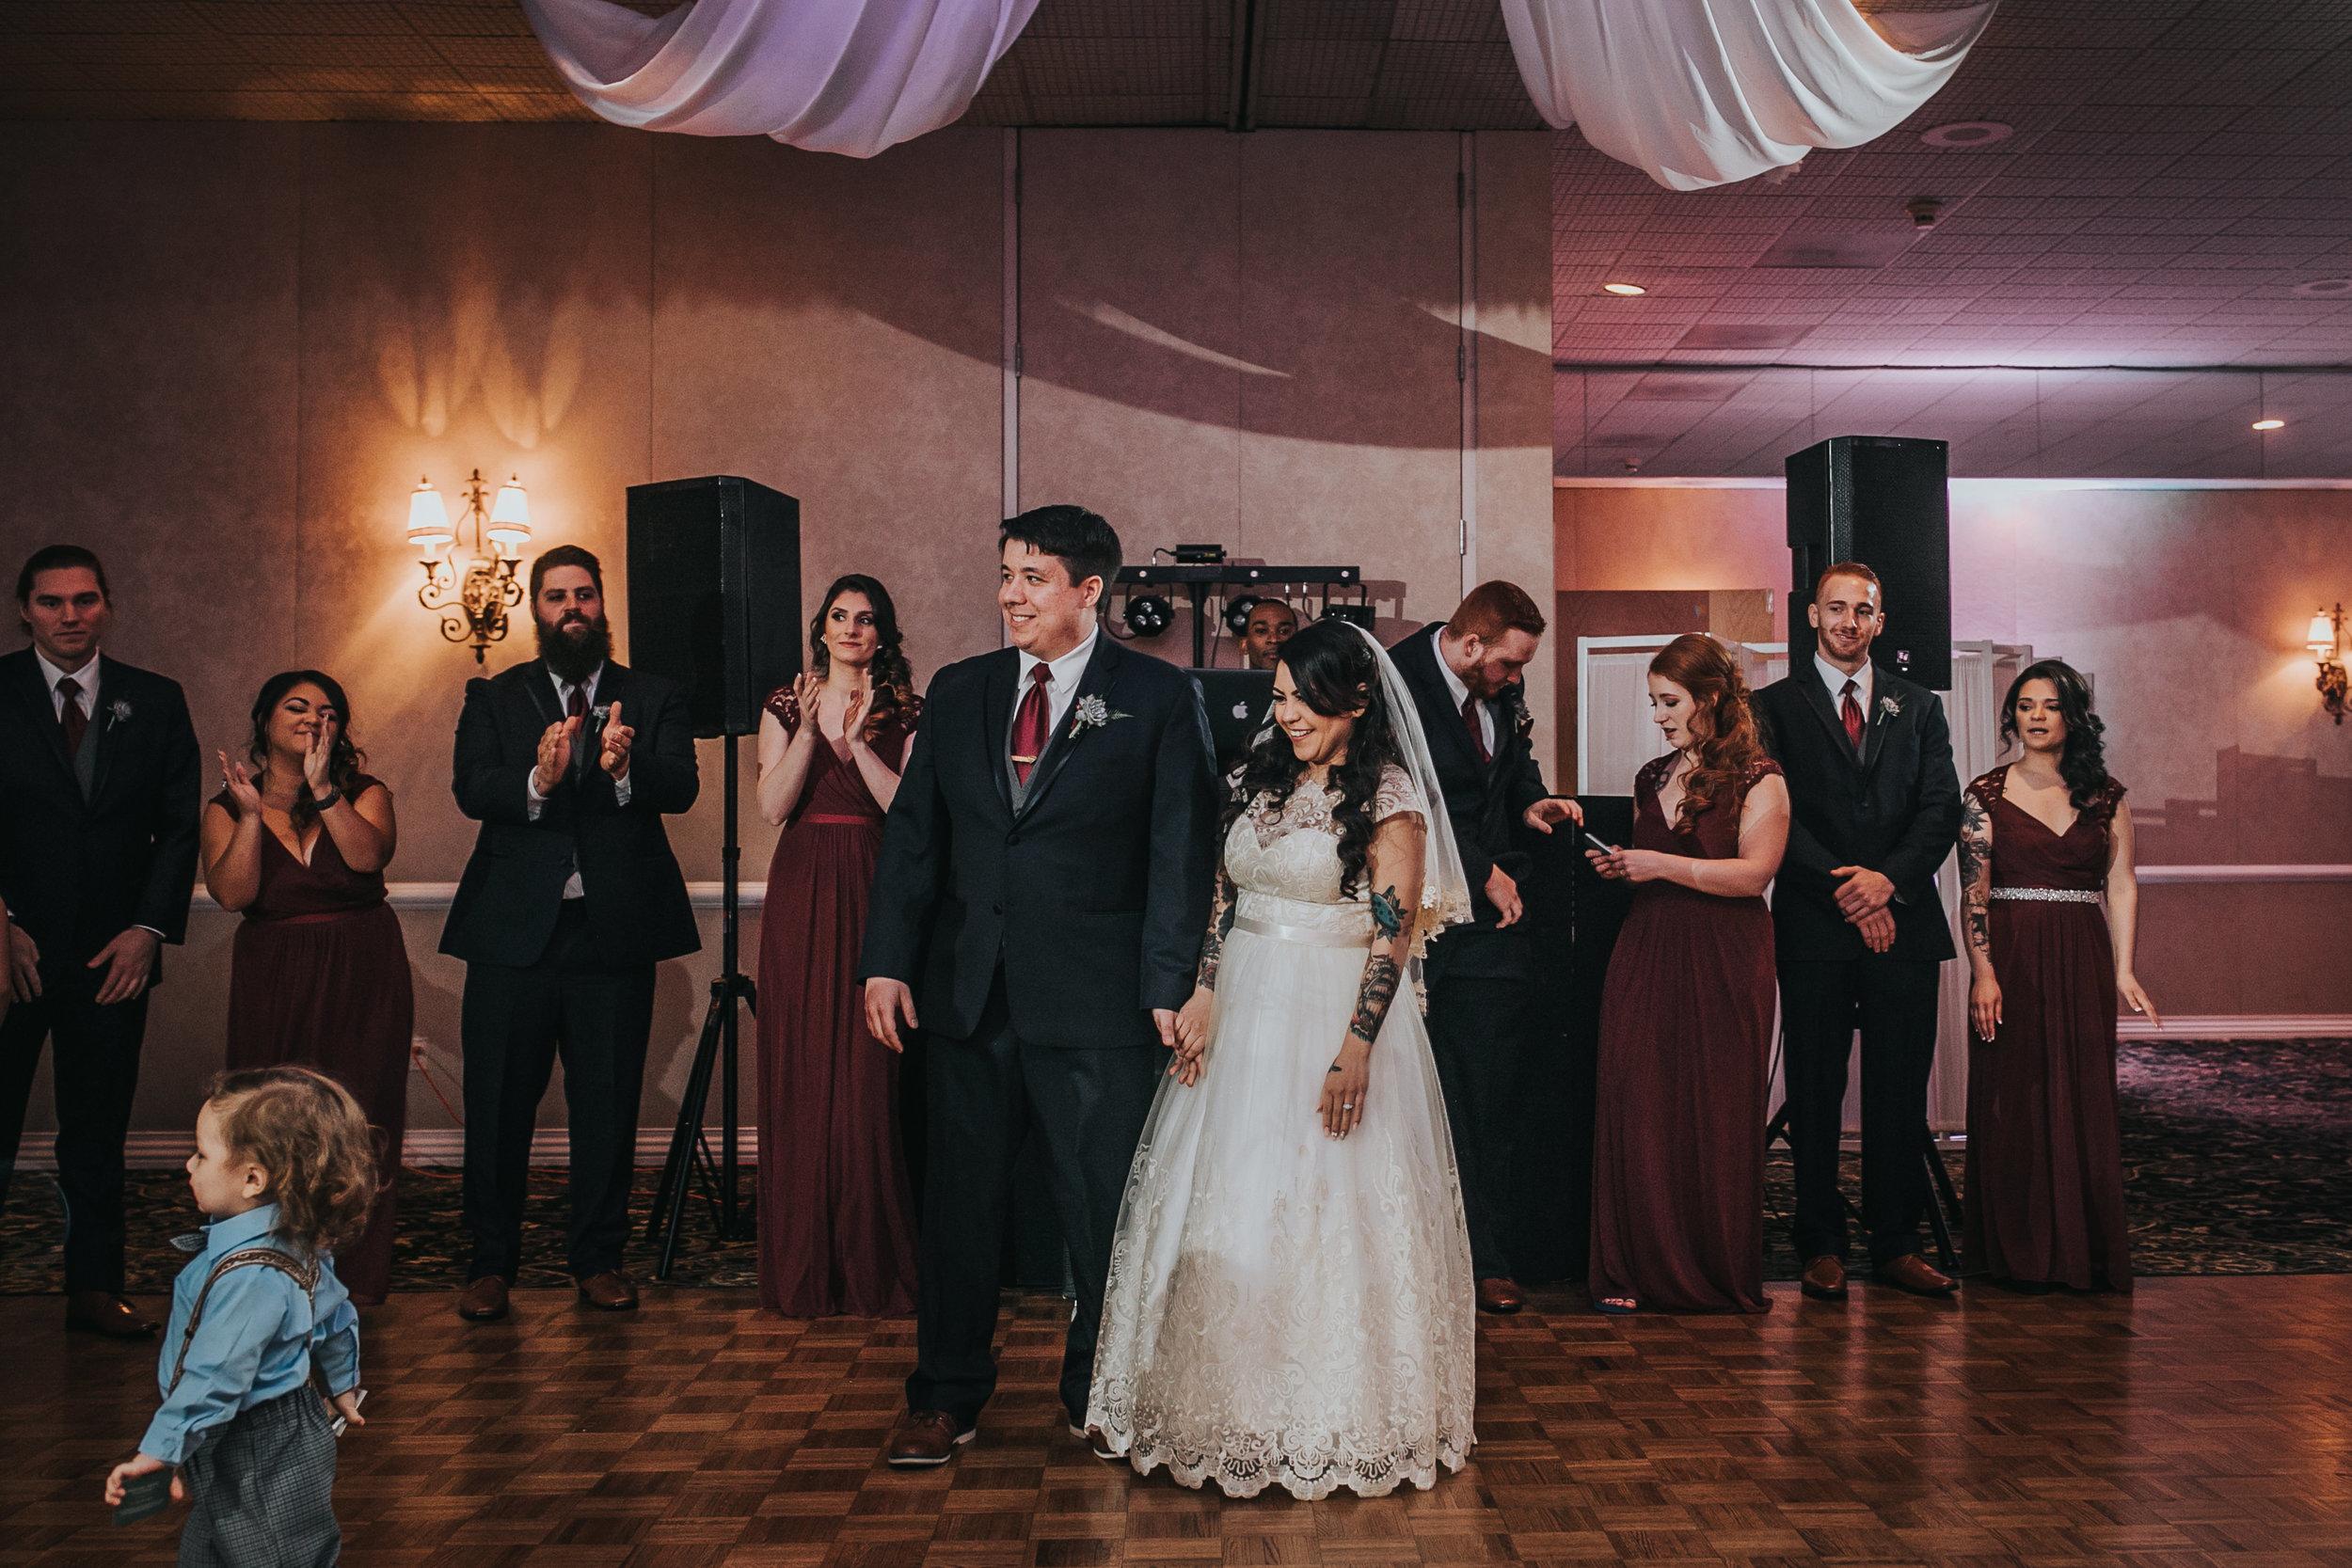 New-Jersey-Wedding-Photographer-ReceptionCenter-Valeria&Mike-Reception (6 of 265).jpg